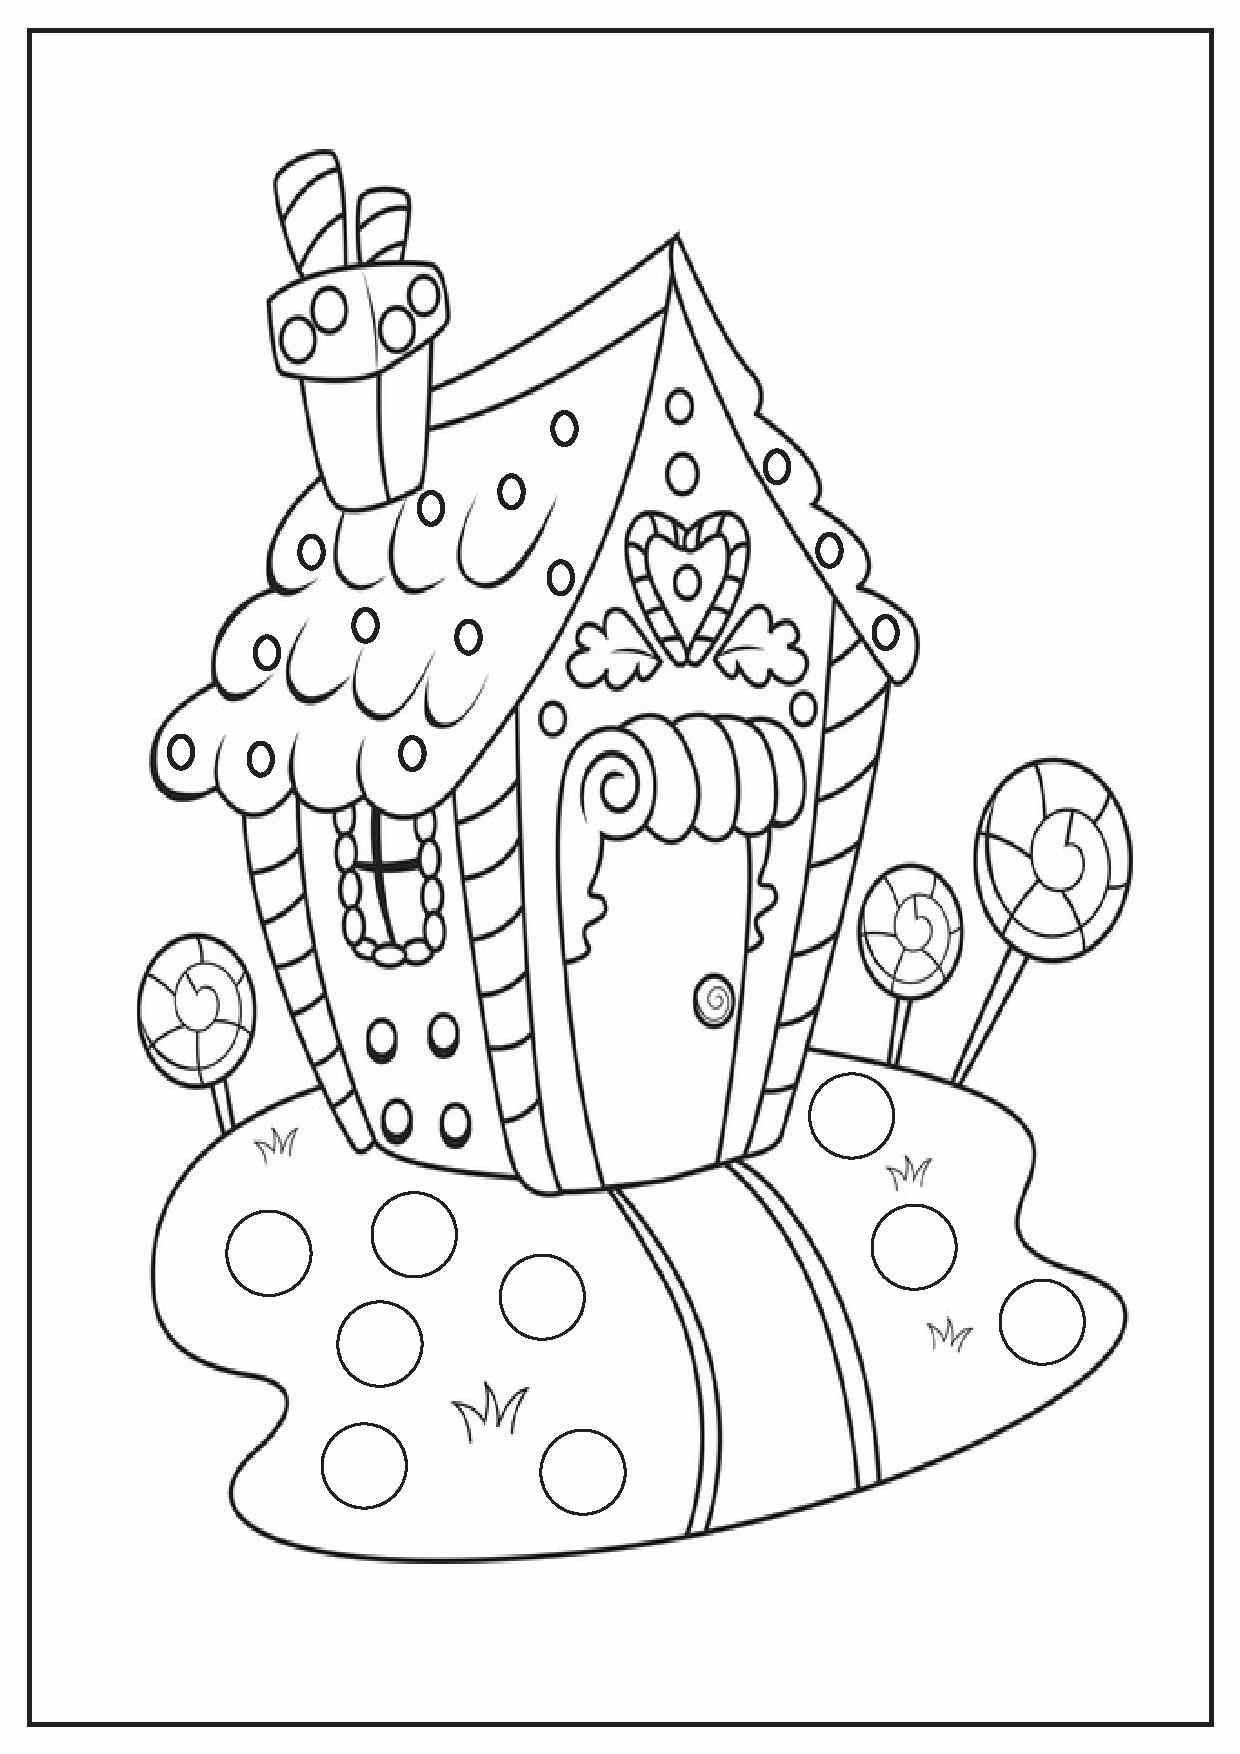 Christmas Worksheets Christmas Coloring Pages Printables Halaman Mewarnai Buku Mewarnai Lembar Mewarnai